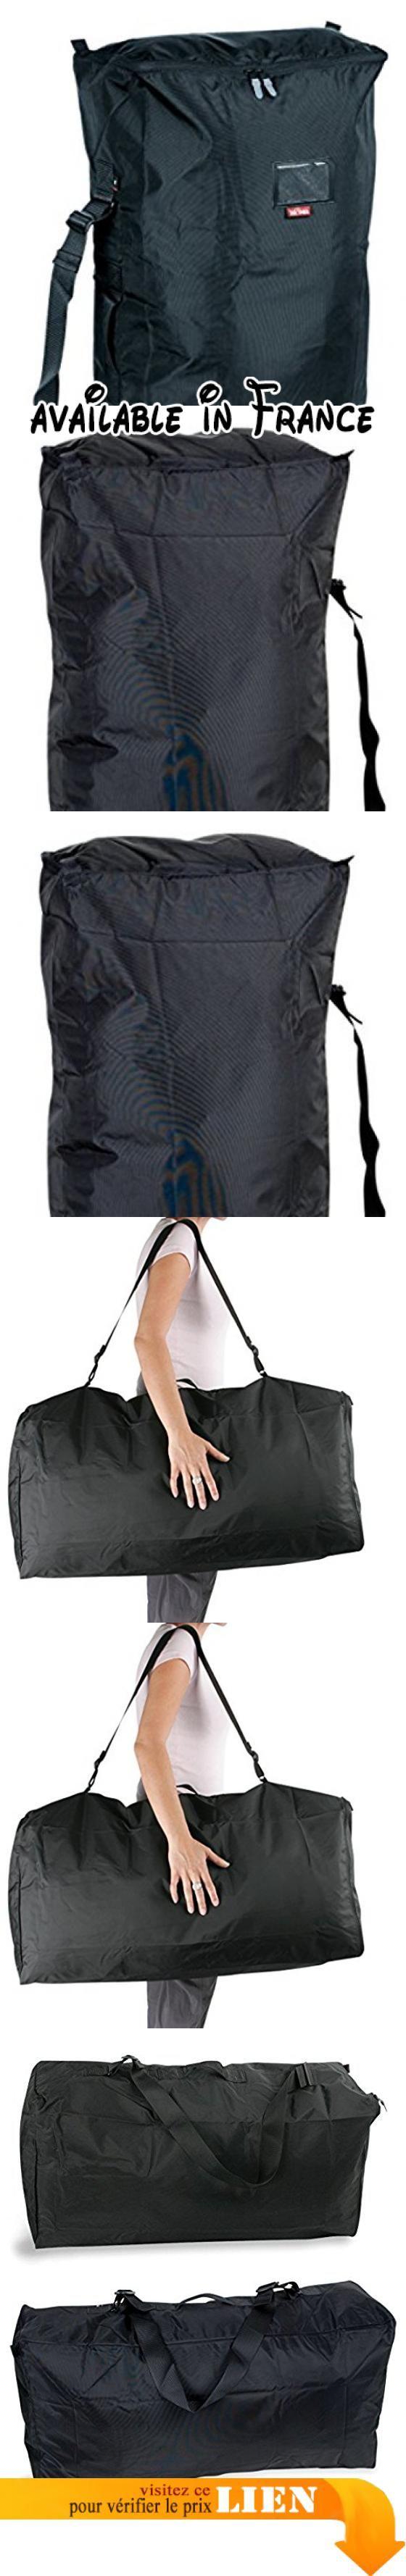 Tatonka Sac de protection Pour sacs à dos Taille M C4ohx